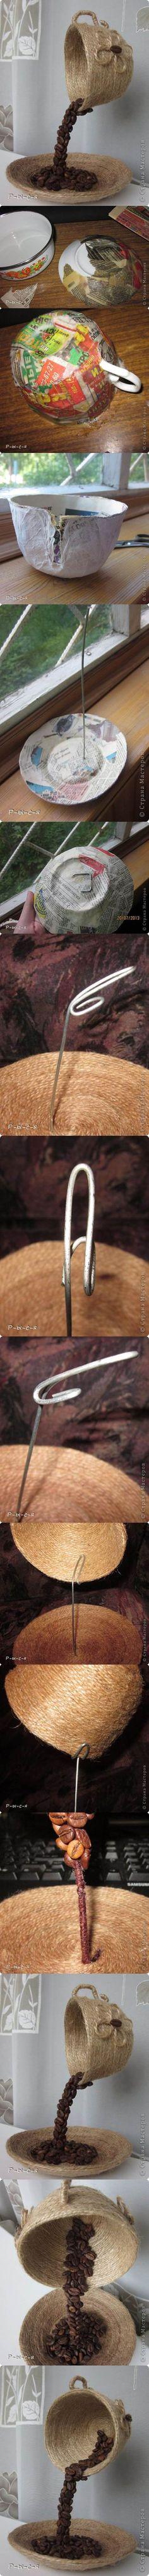 DIY Unique Table Decor with Coffee Beans | iCreativeIdeas.com